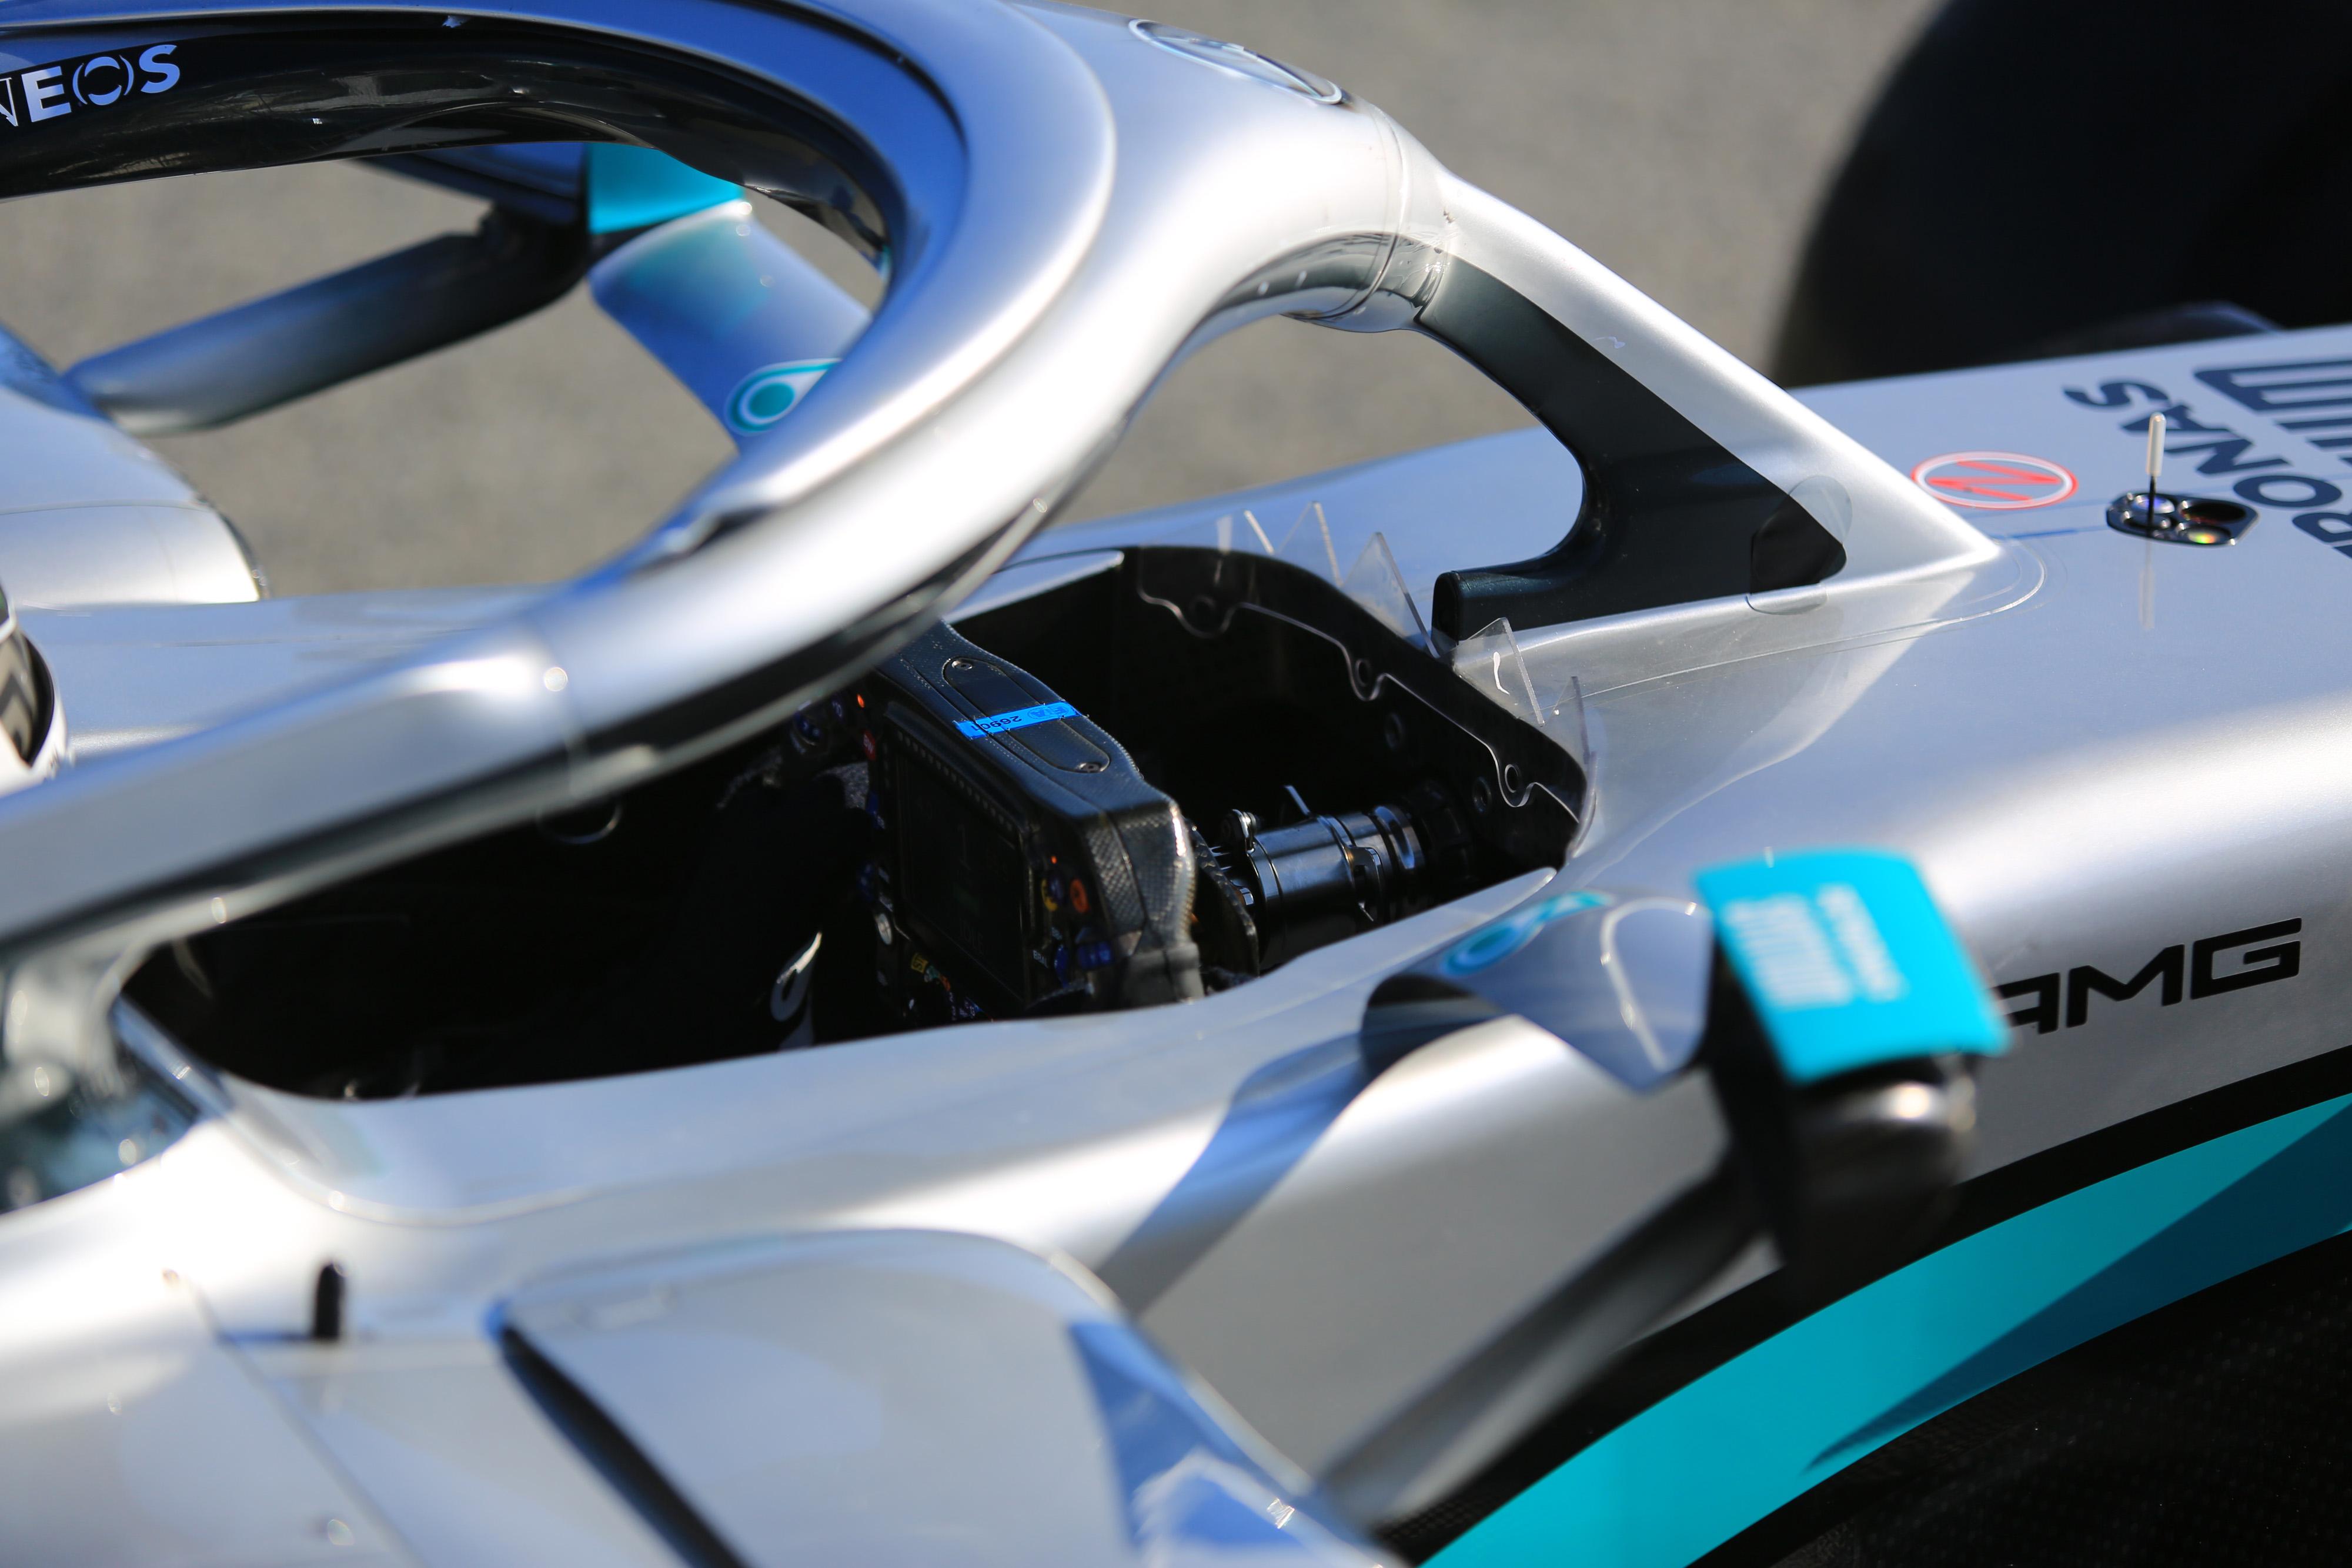 F1 Formula 1 Mercedes steering wheels DAS